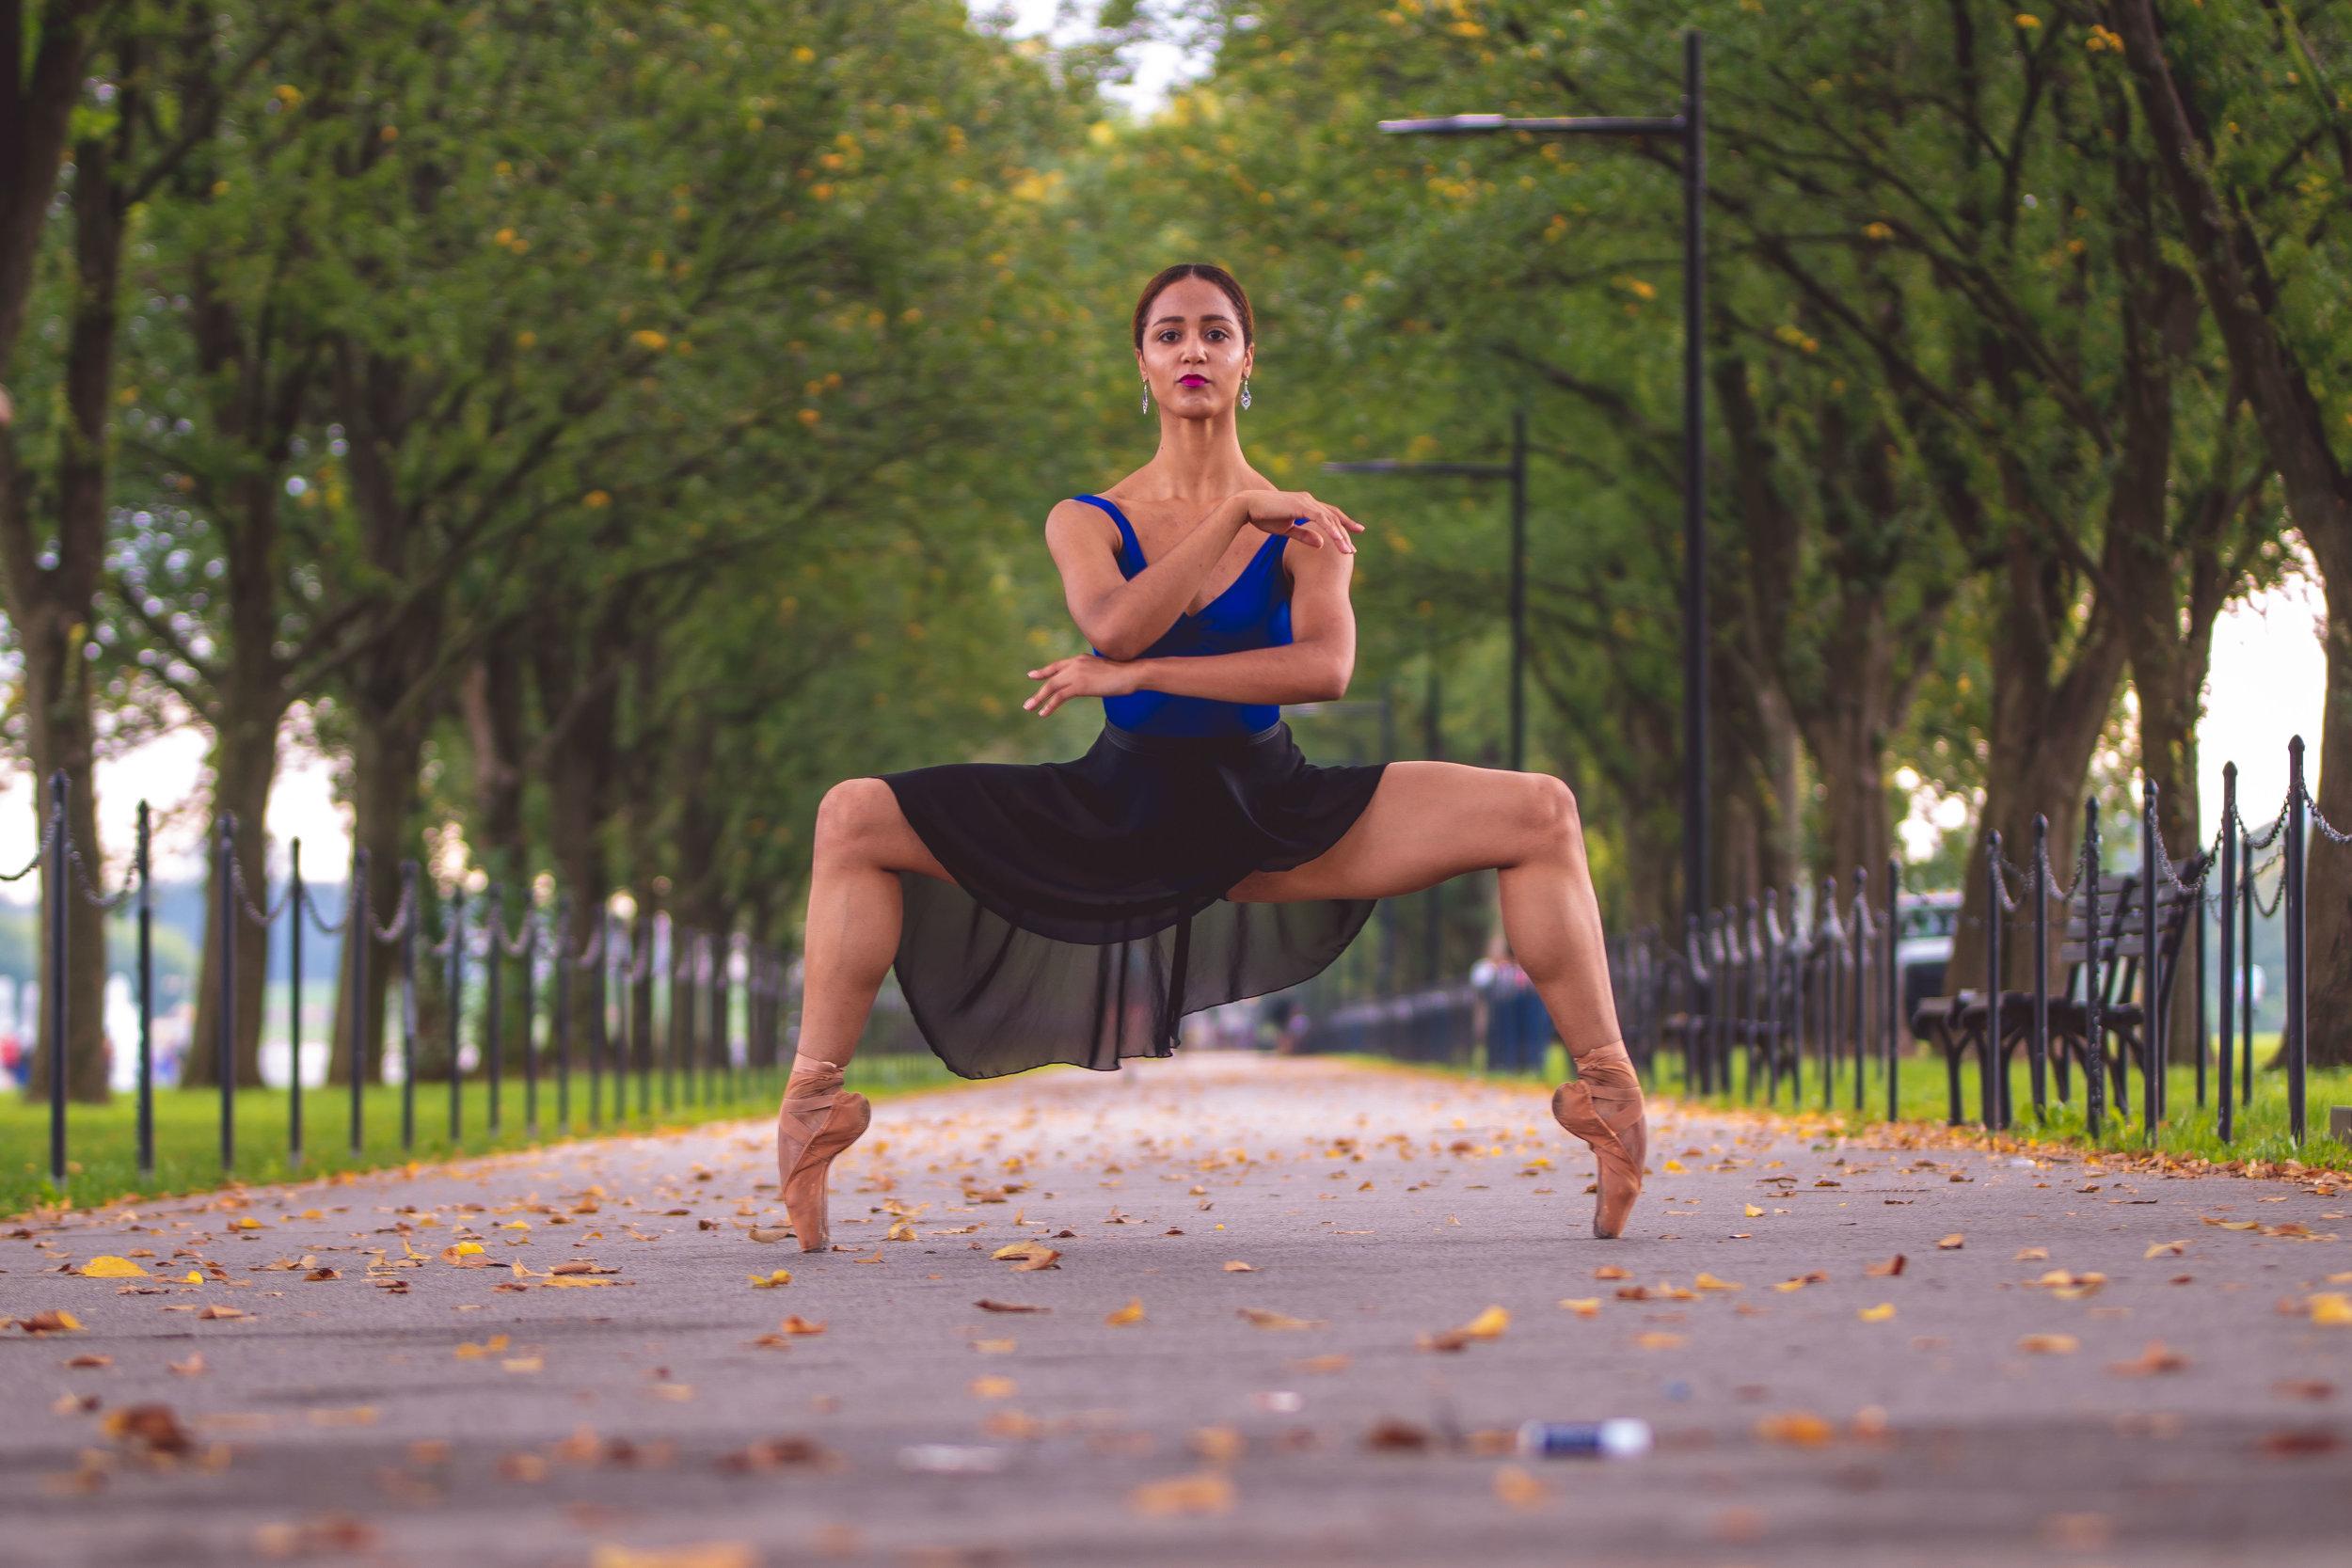 Audrey_Malek_Black_Ballet_Dancer_at_Lincoln_Memorial_Leanila_Photos_DC_Photographer-018.jpg